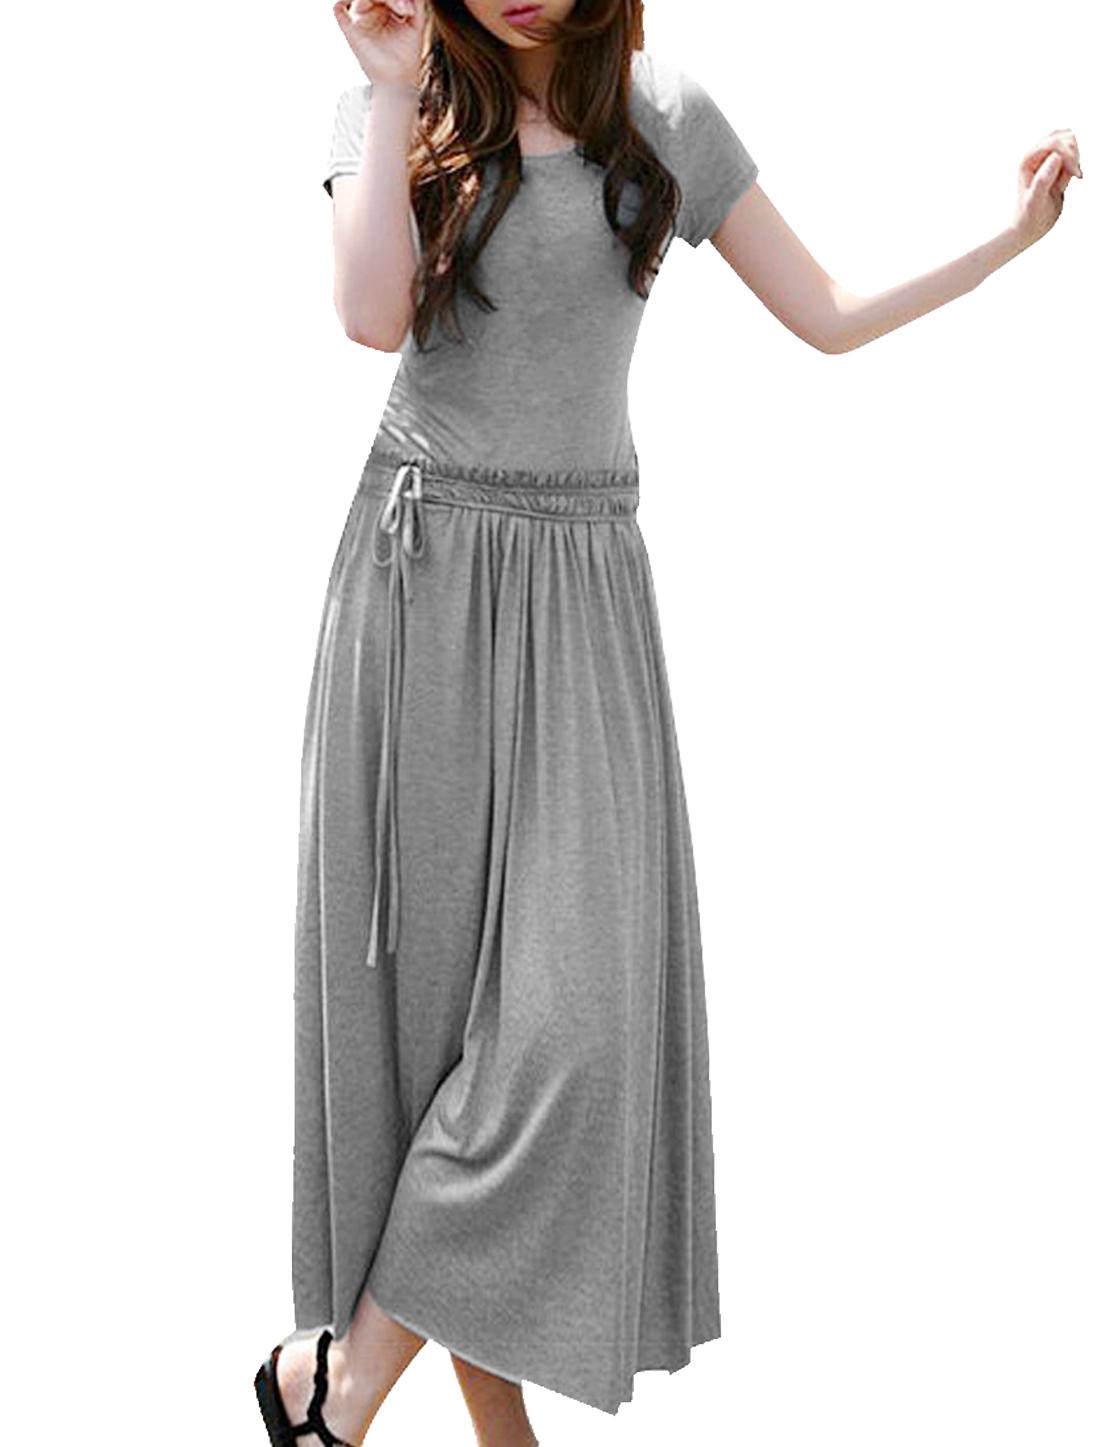 Woman Drawstring Waist Short Sleeve Full-length Dress Heather Gray L